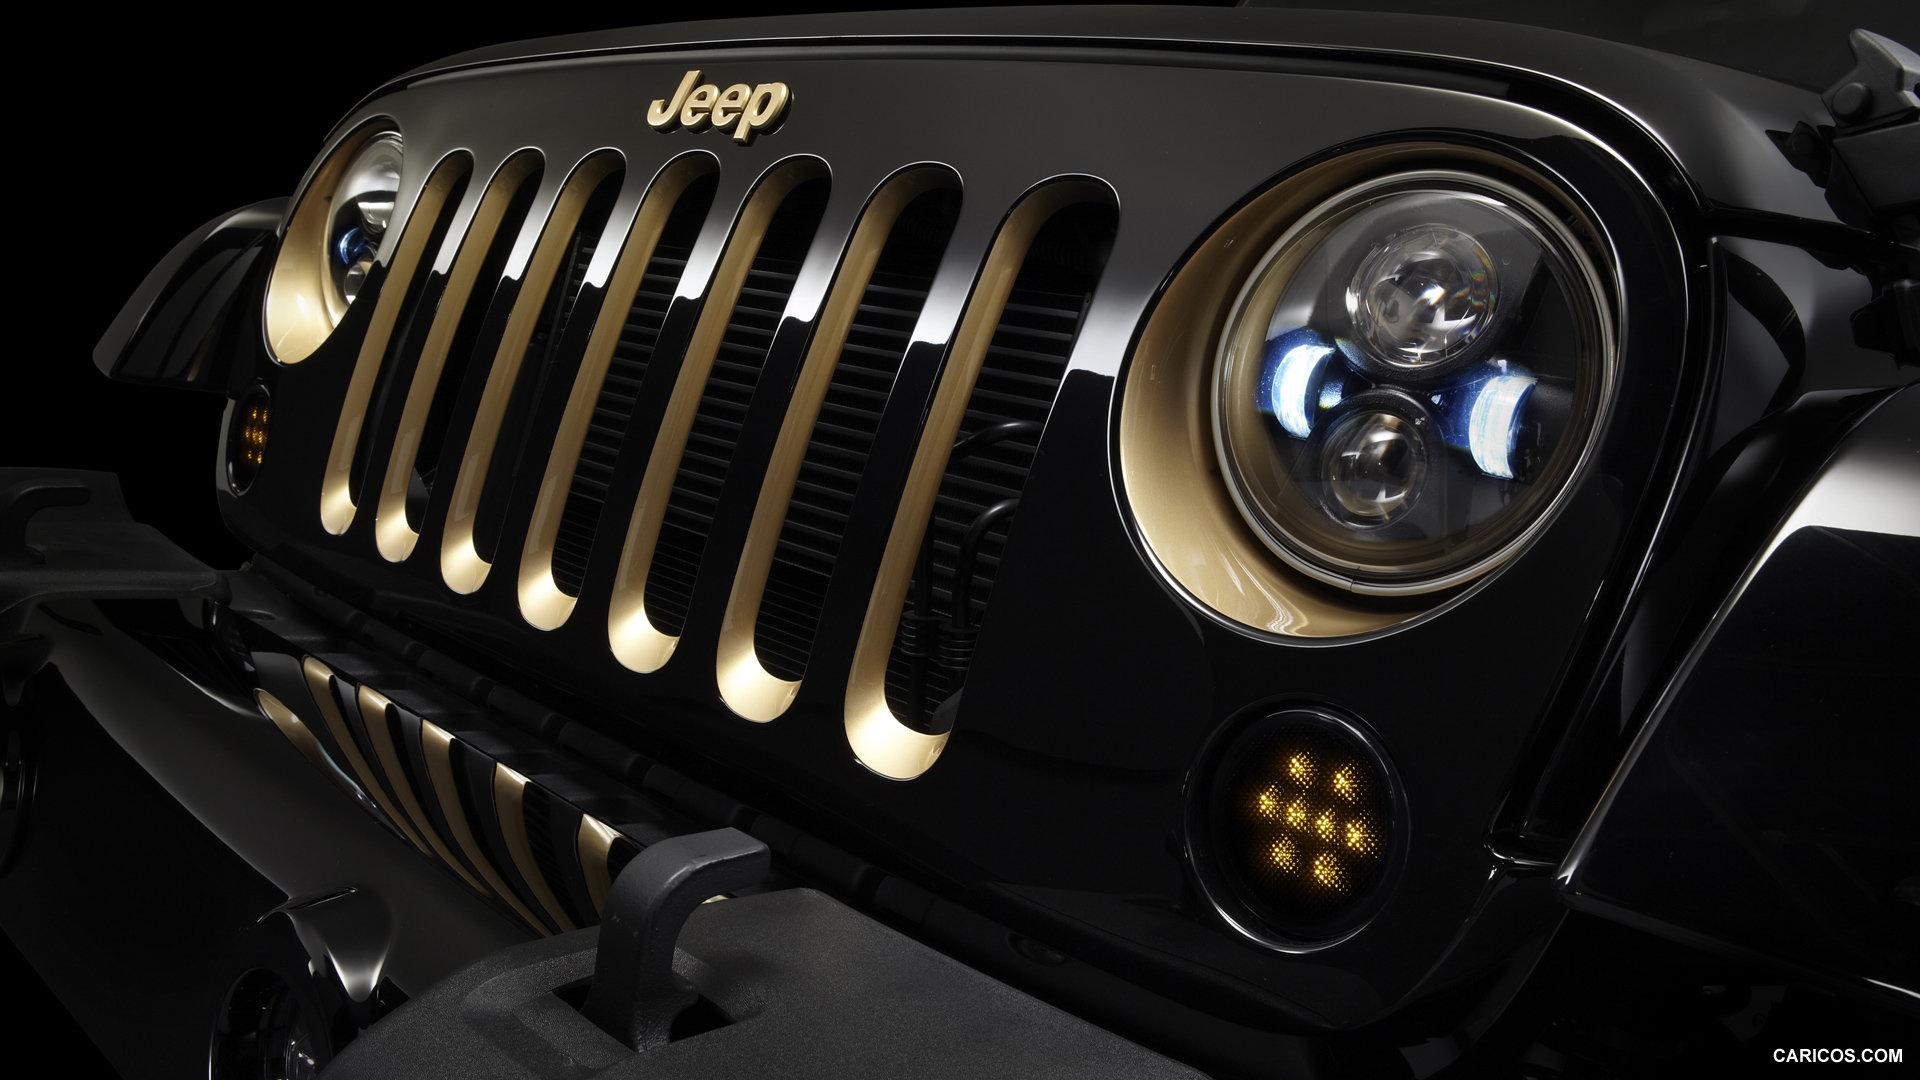 Jeep Wrangler Wallpapers 1920x1080 Full Hd 1080p Desktop Backgrounds